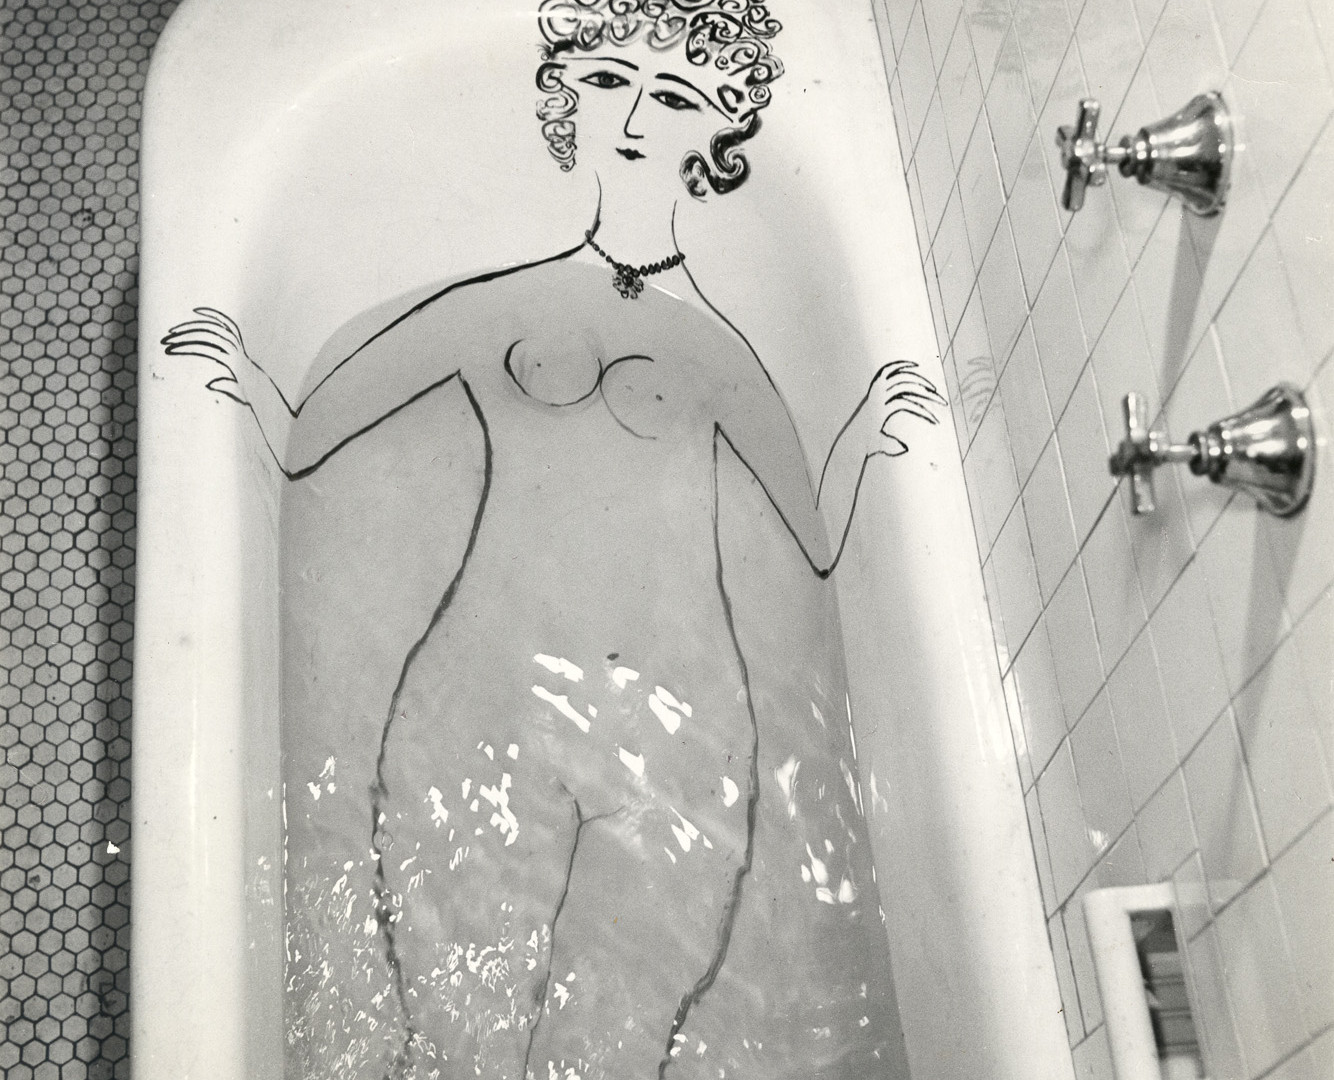 Saul Steinberg, Girl in Tub, 1949